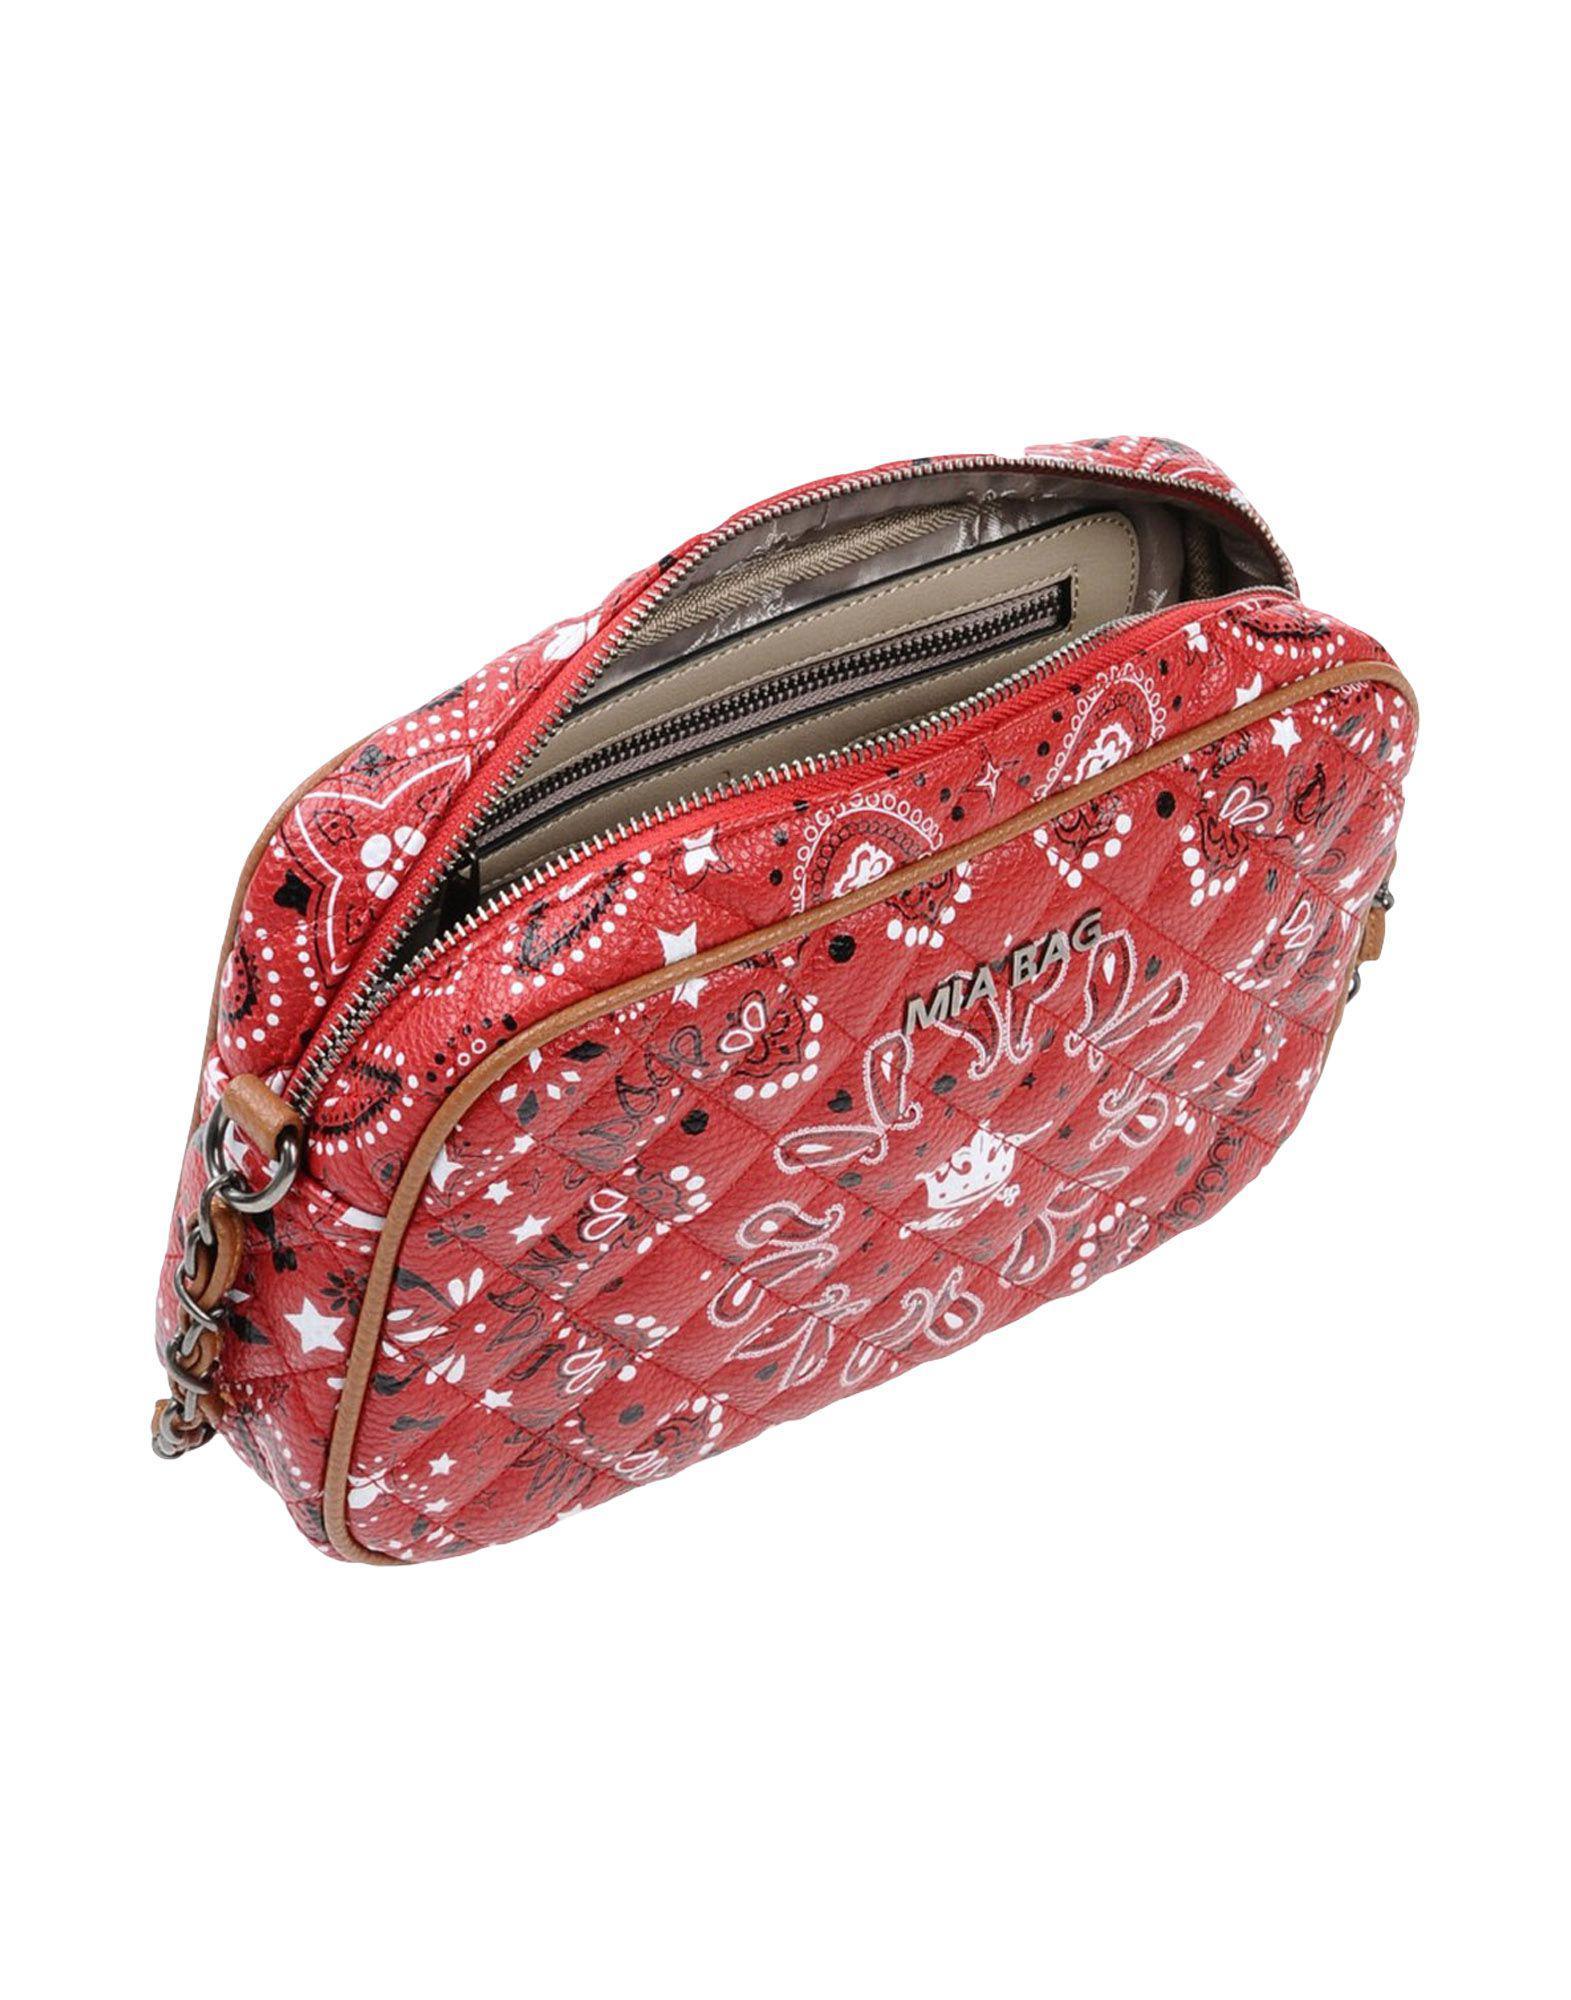 Mia Bag Cross-body Bag in Red